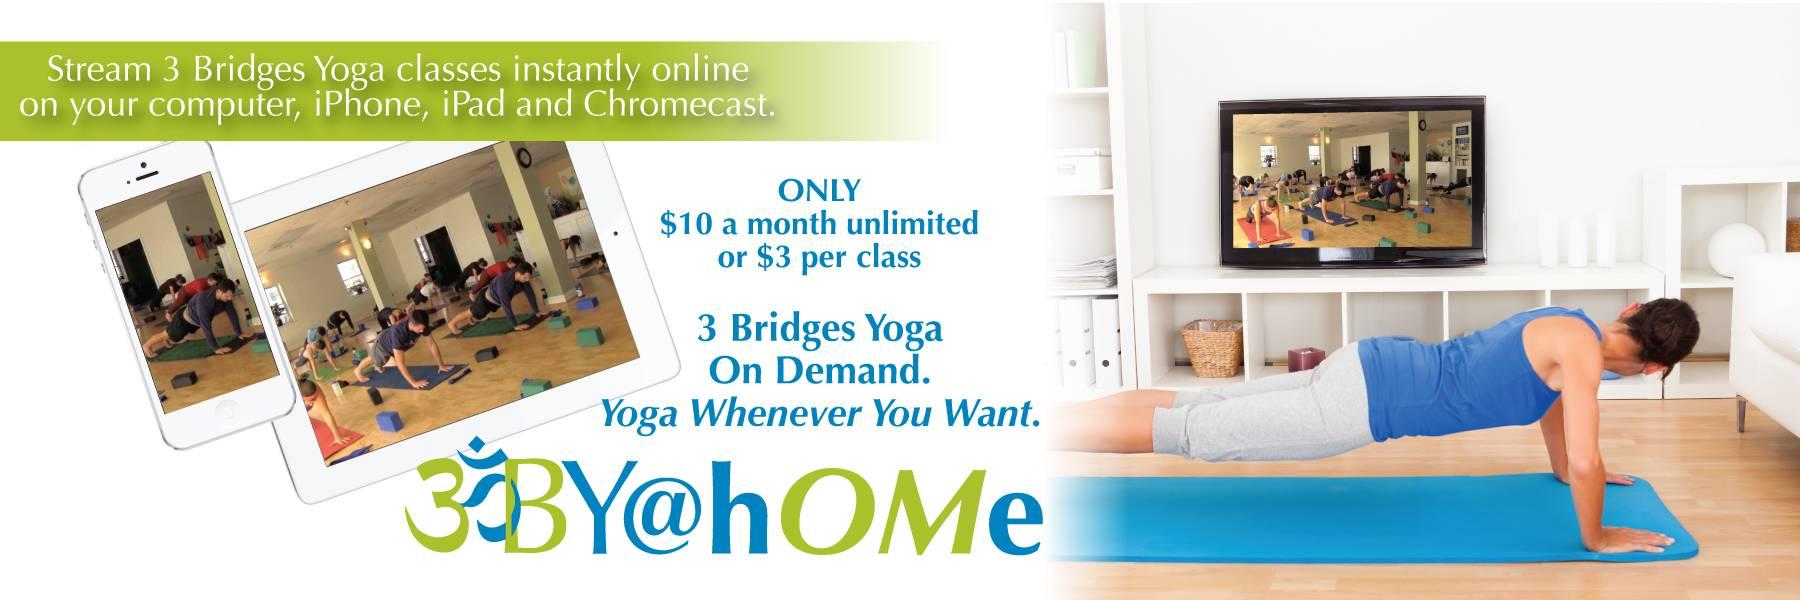 Principled Vinyasa Flow Yoga